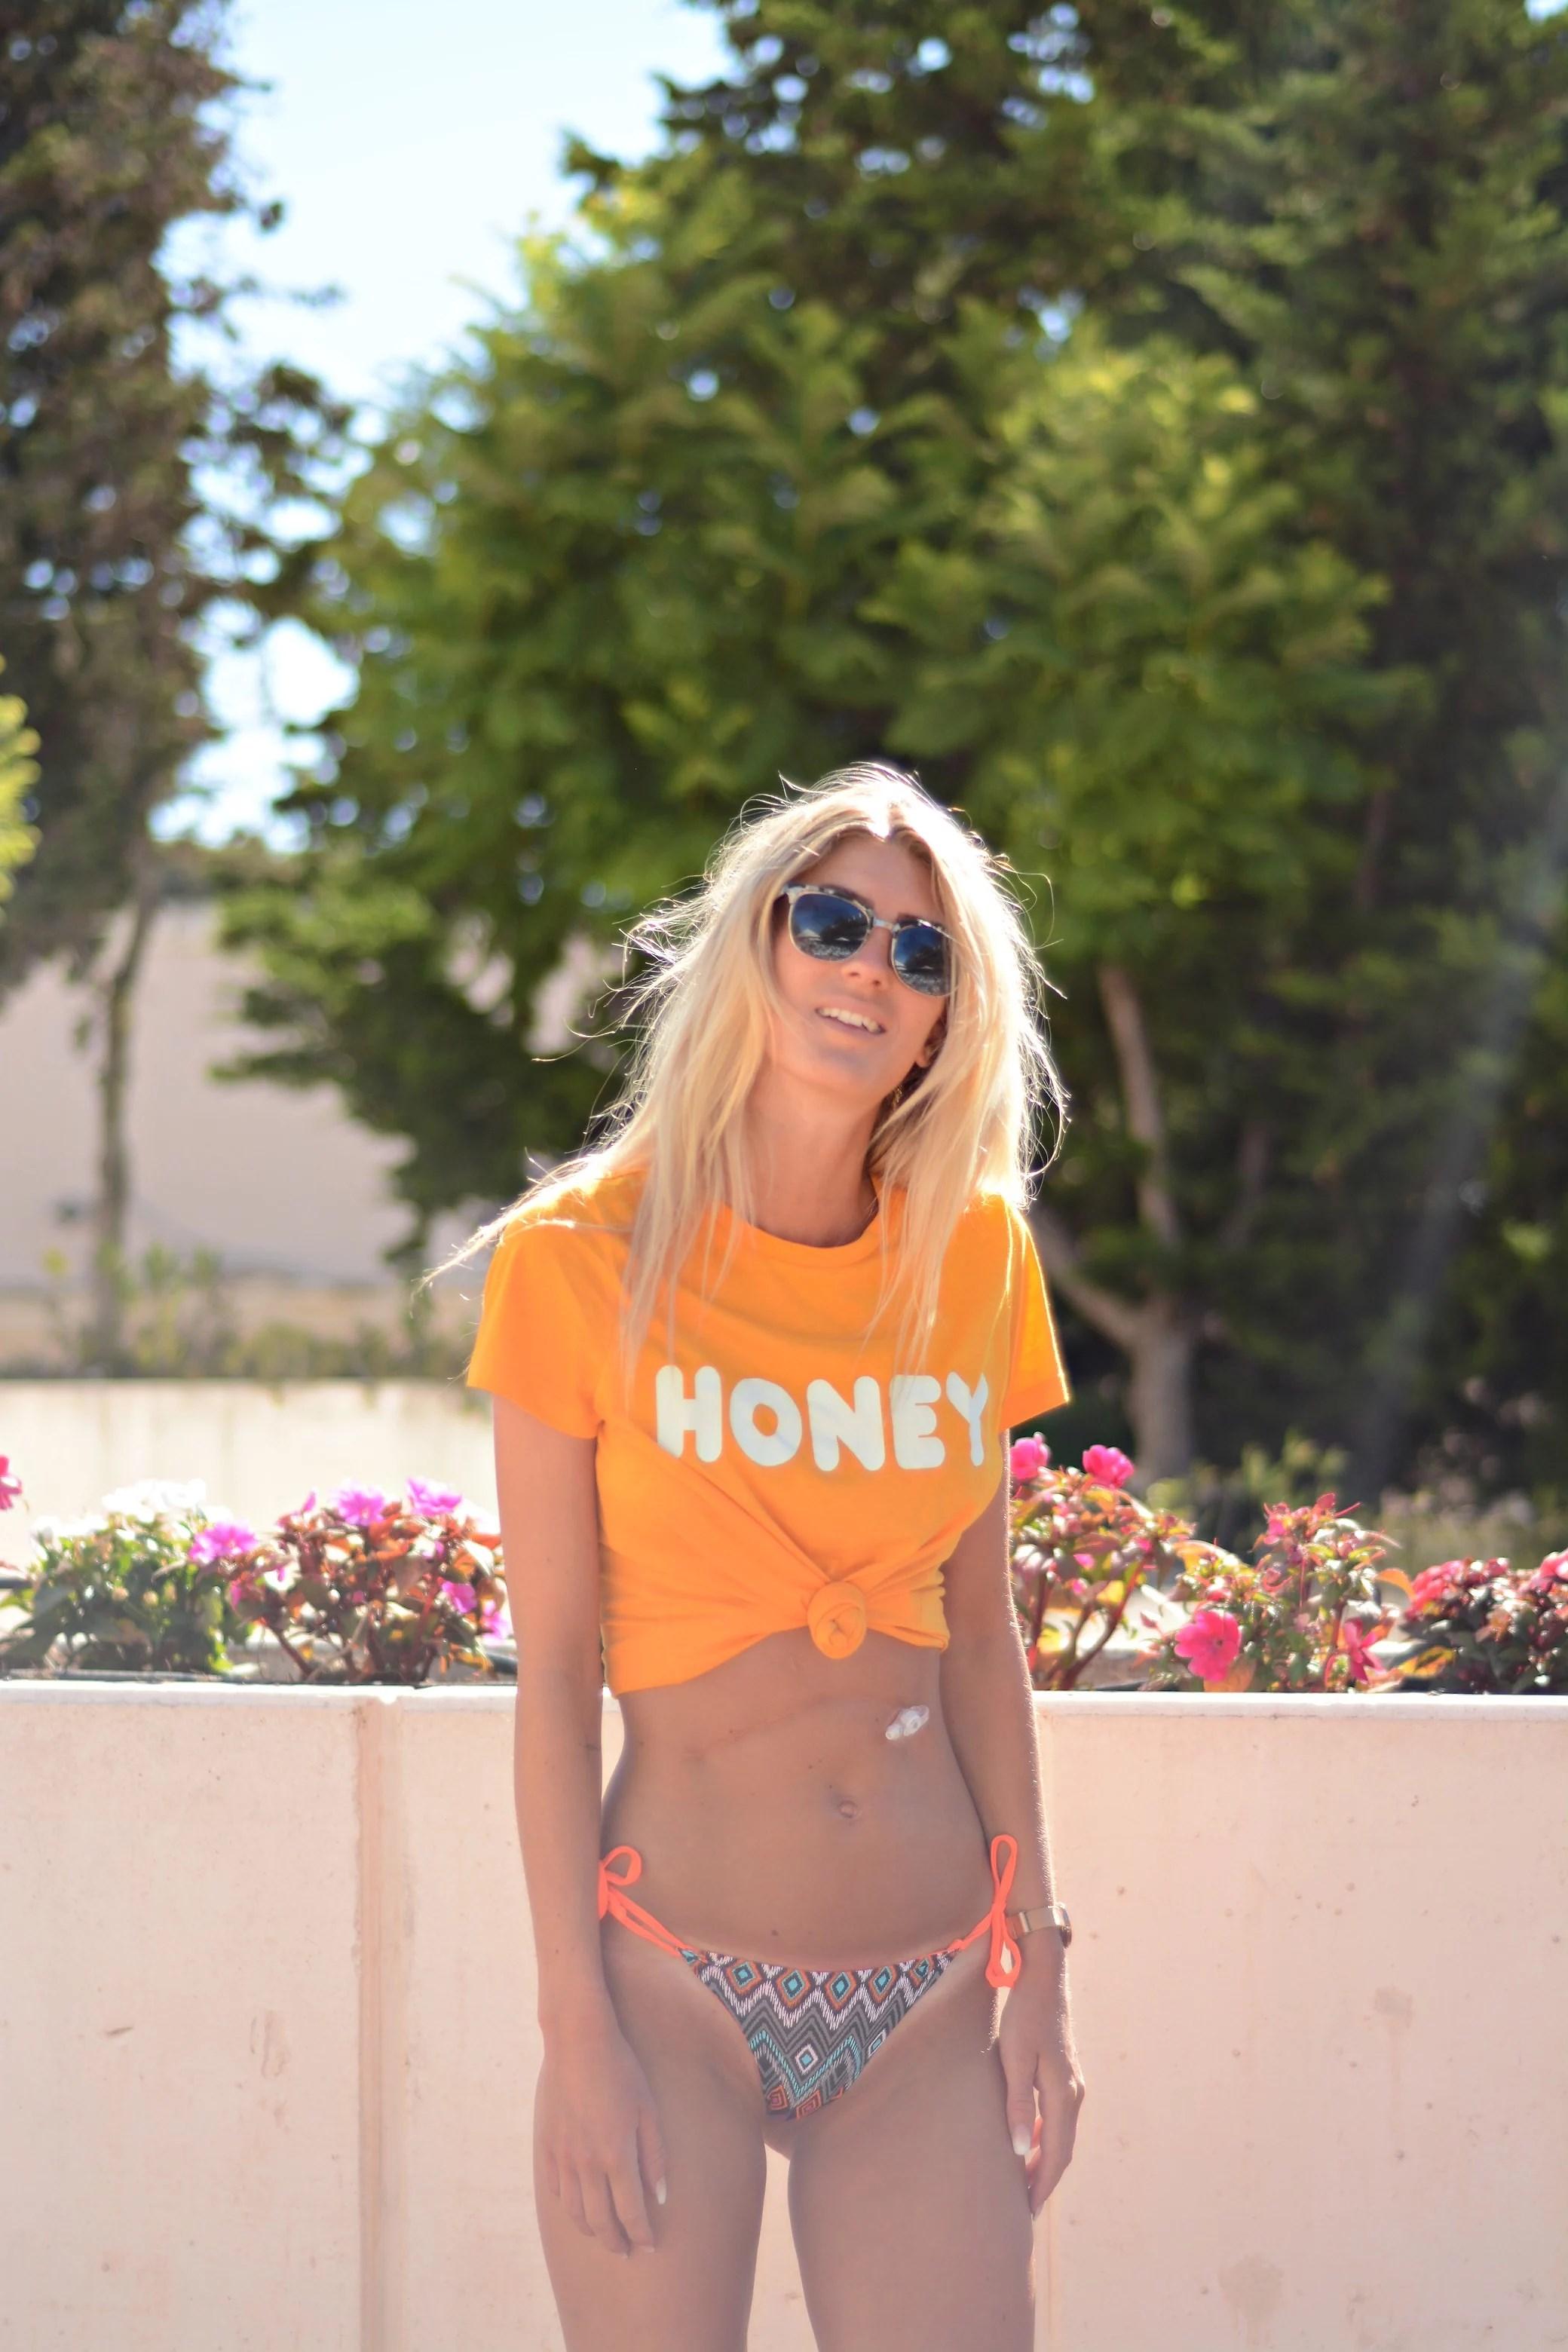 HONEY - LISTA